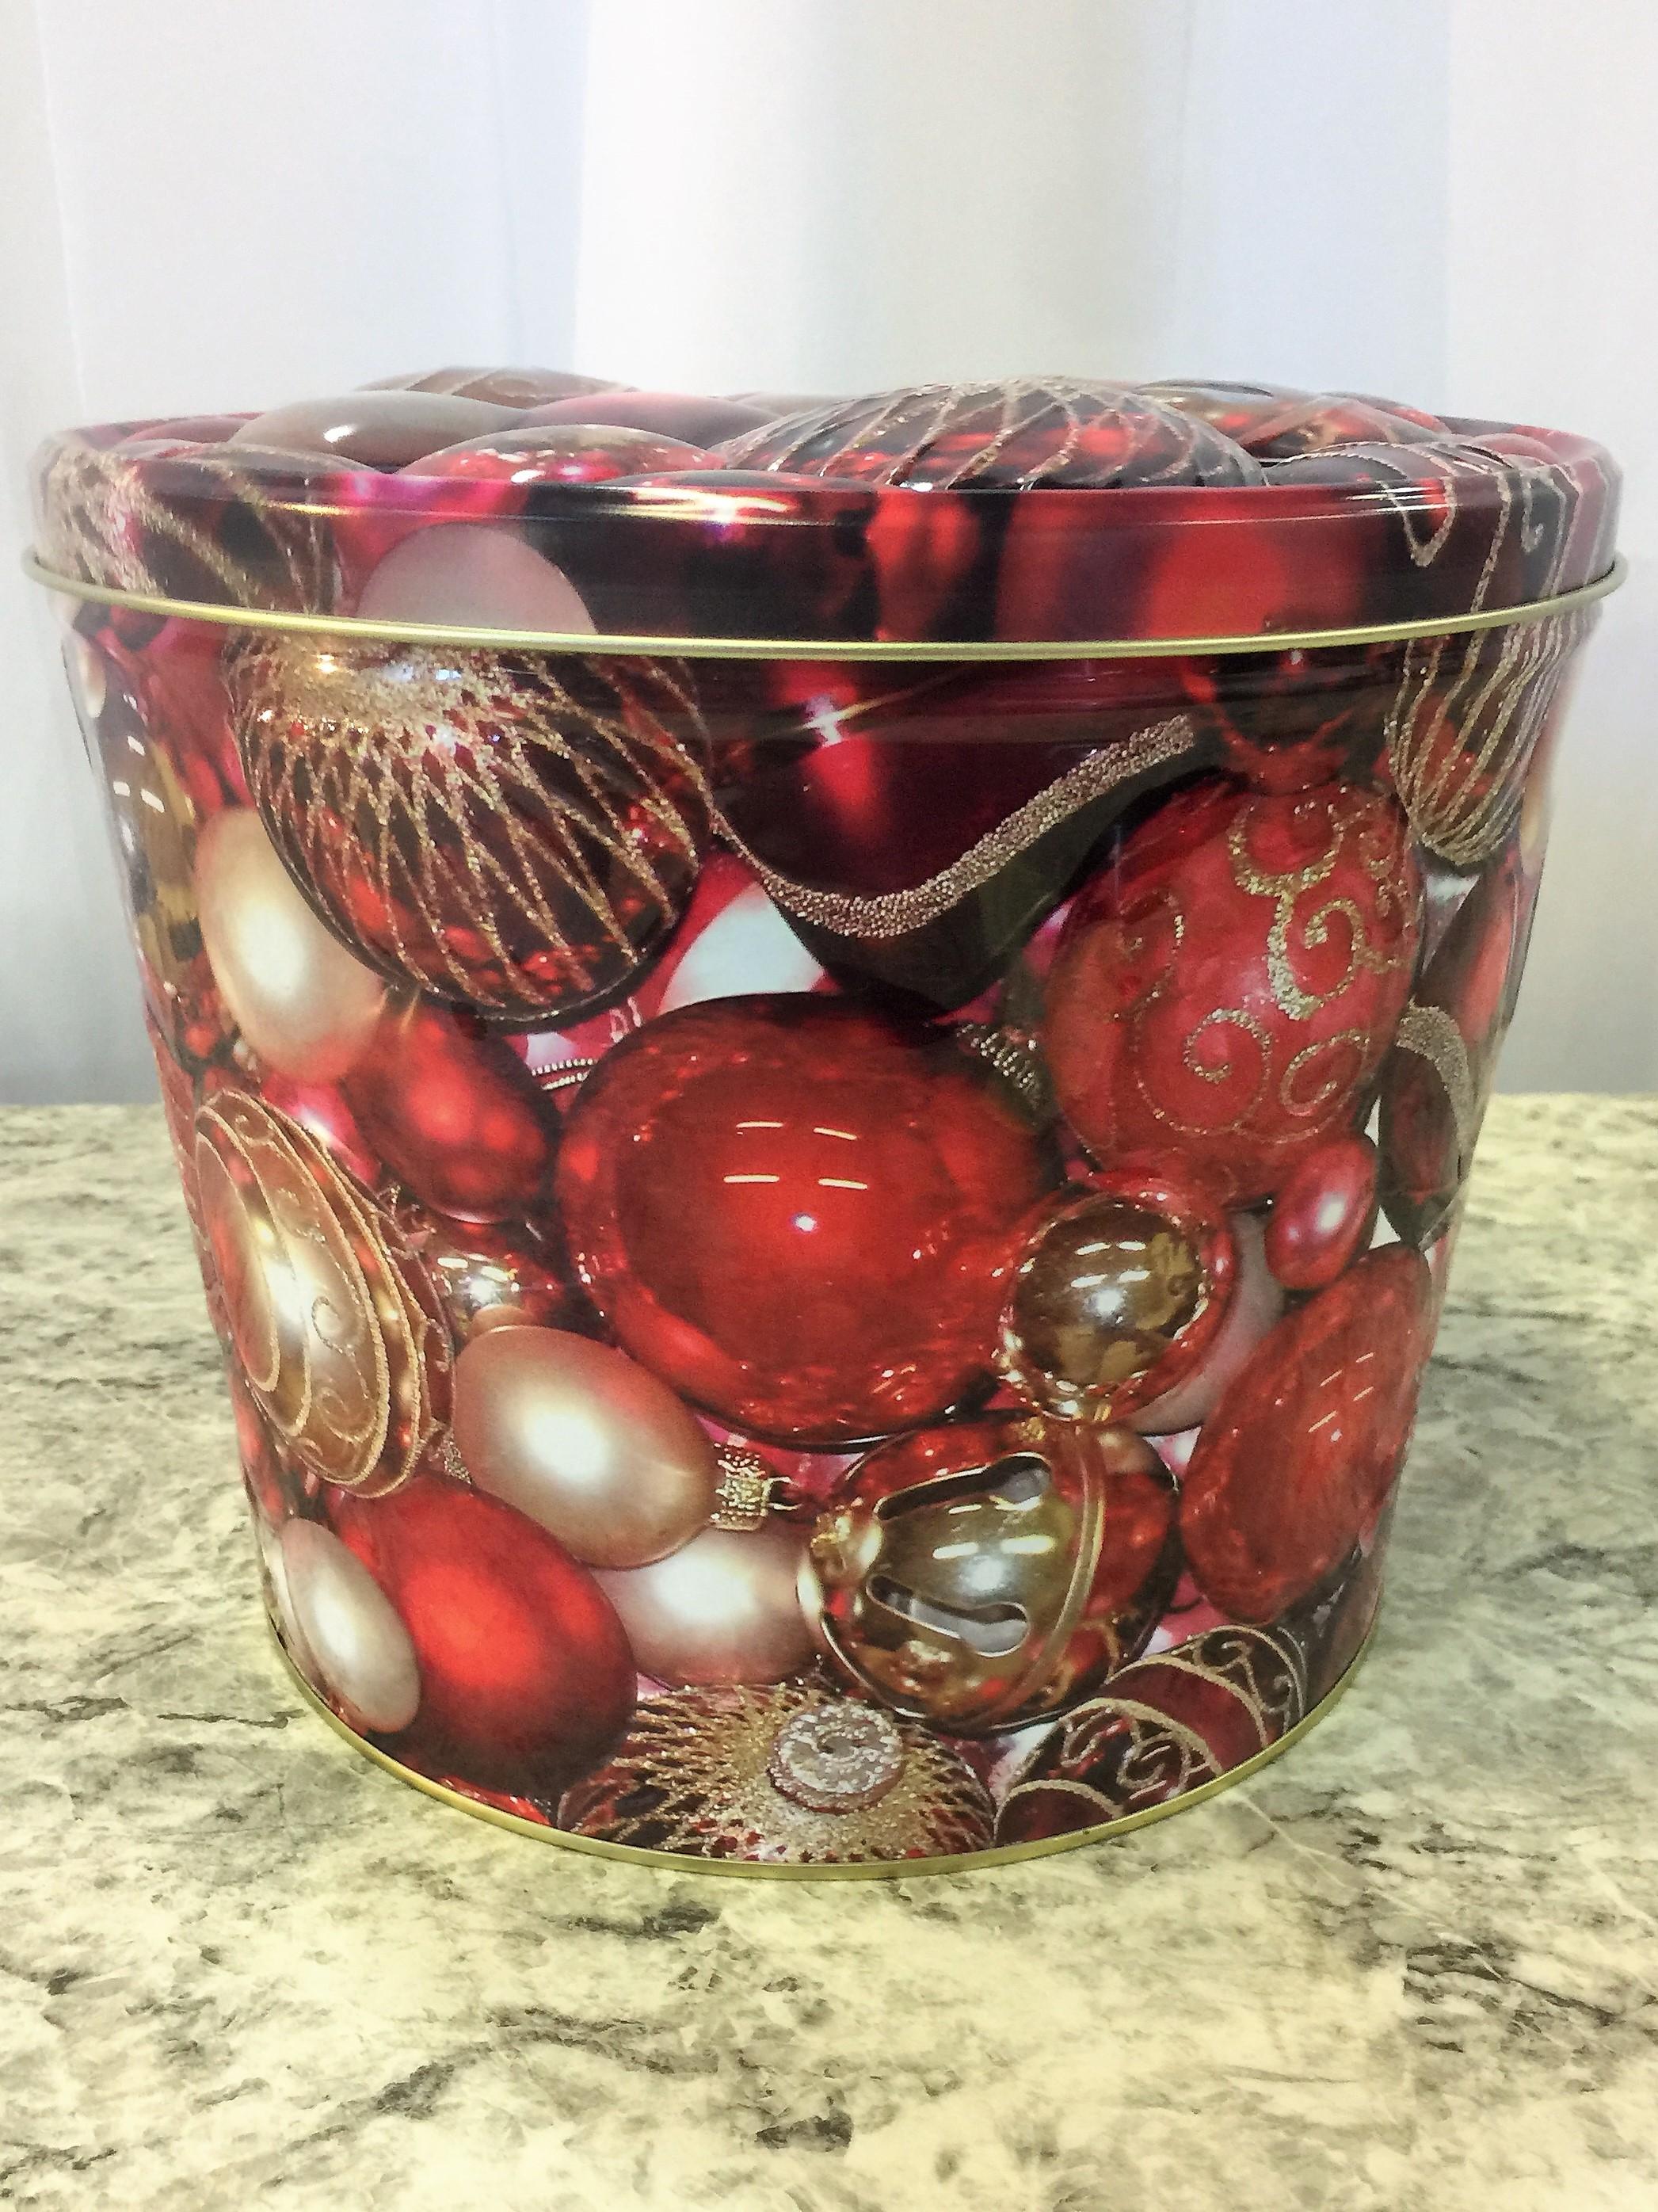 2 Gal Holiday Ornaments Popcorn Tin